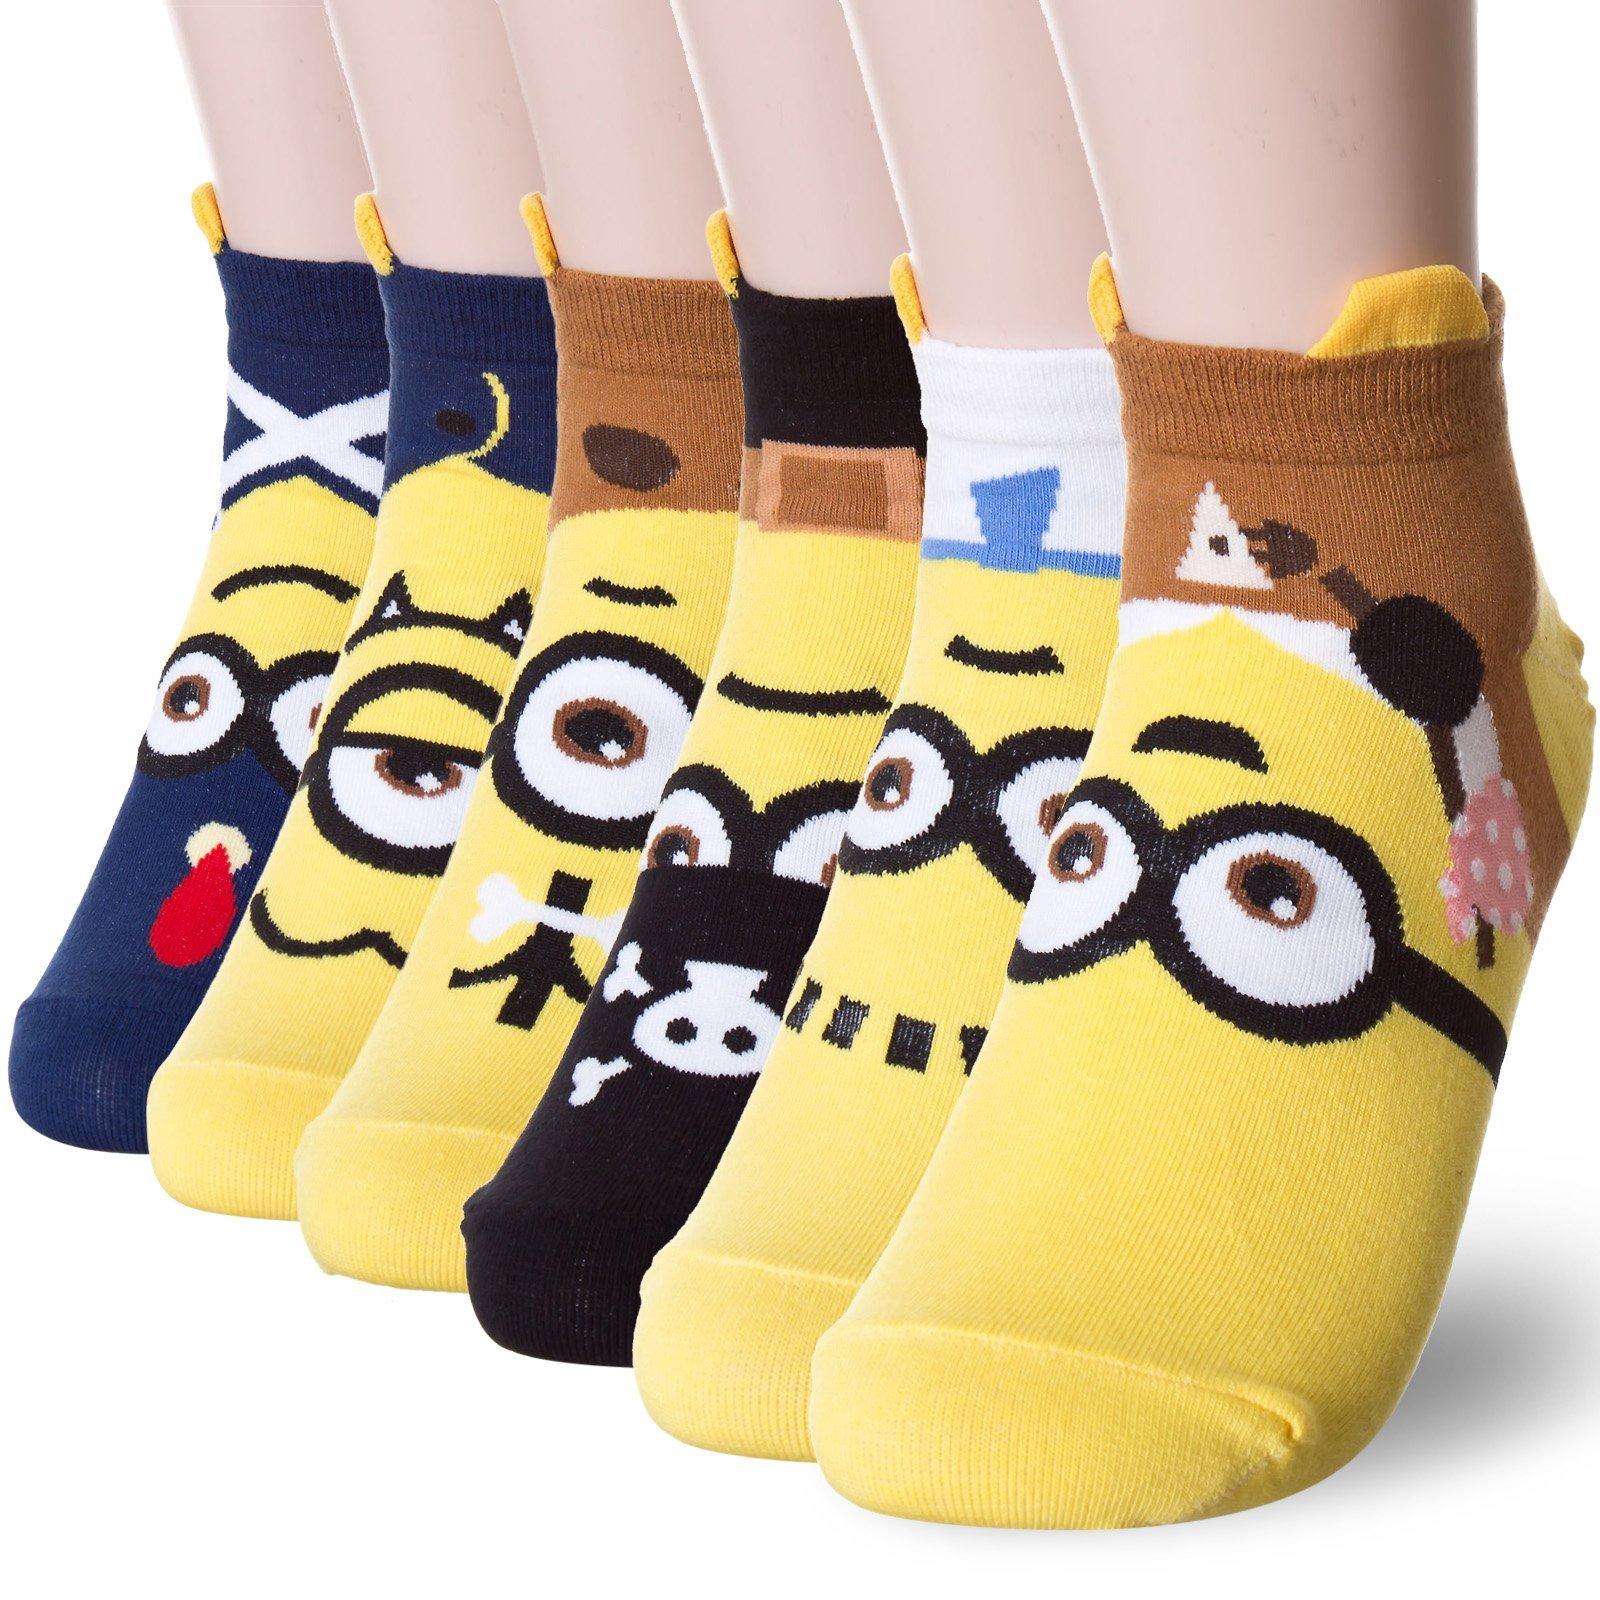 Popular Minions Character Socks (Onesize, 6 Pairs)